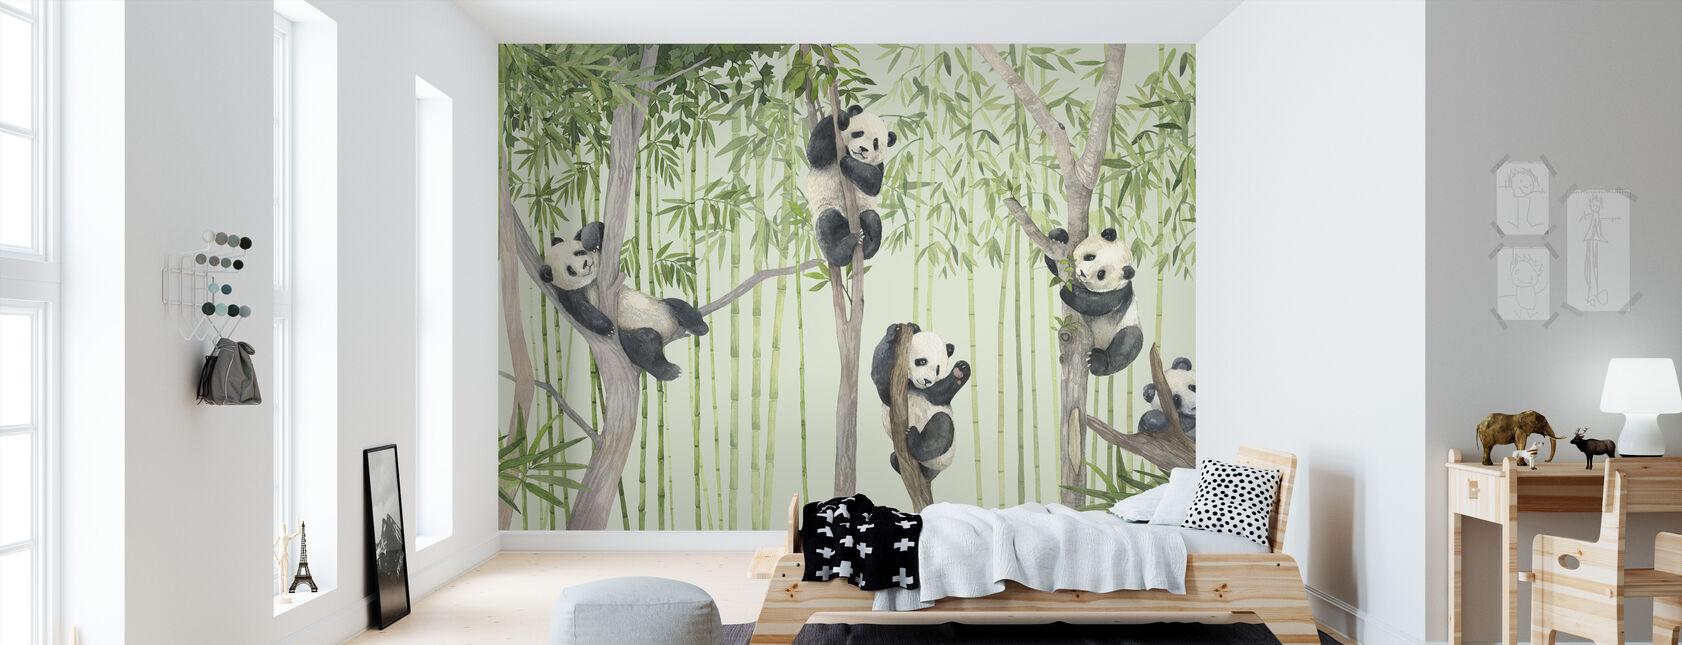 Amici Panda - Carta da parati - Camera dei bambini